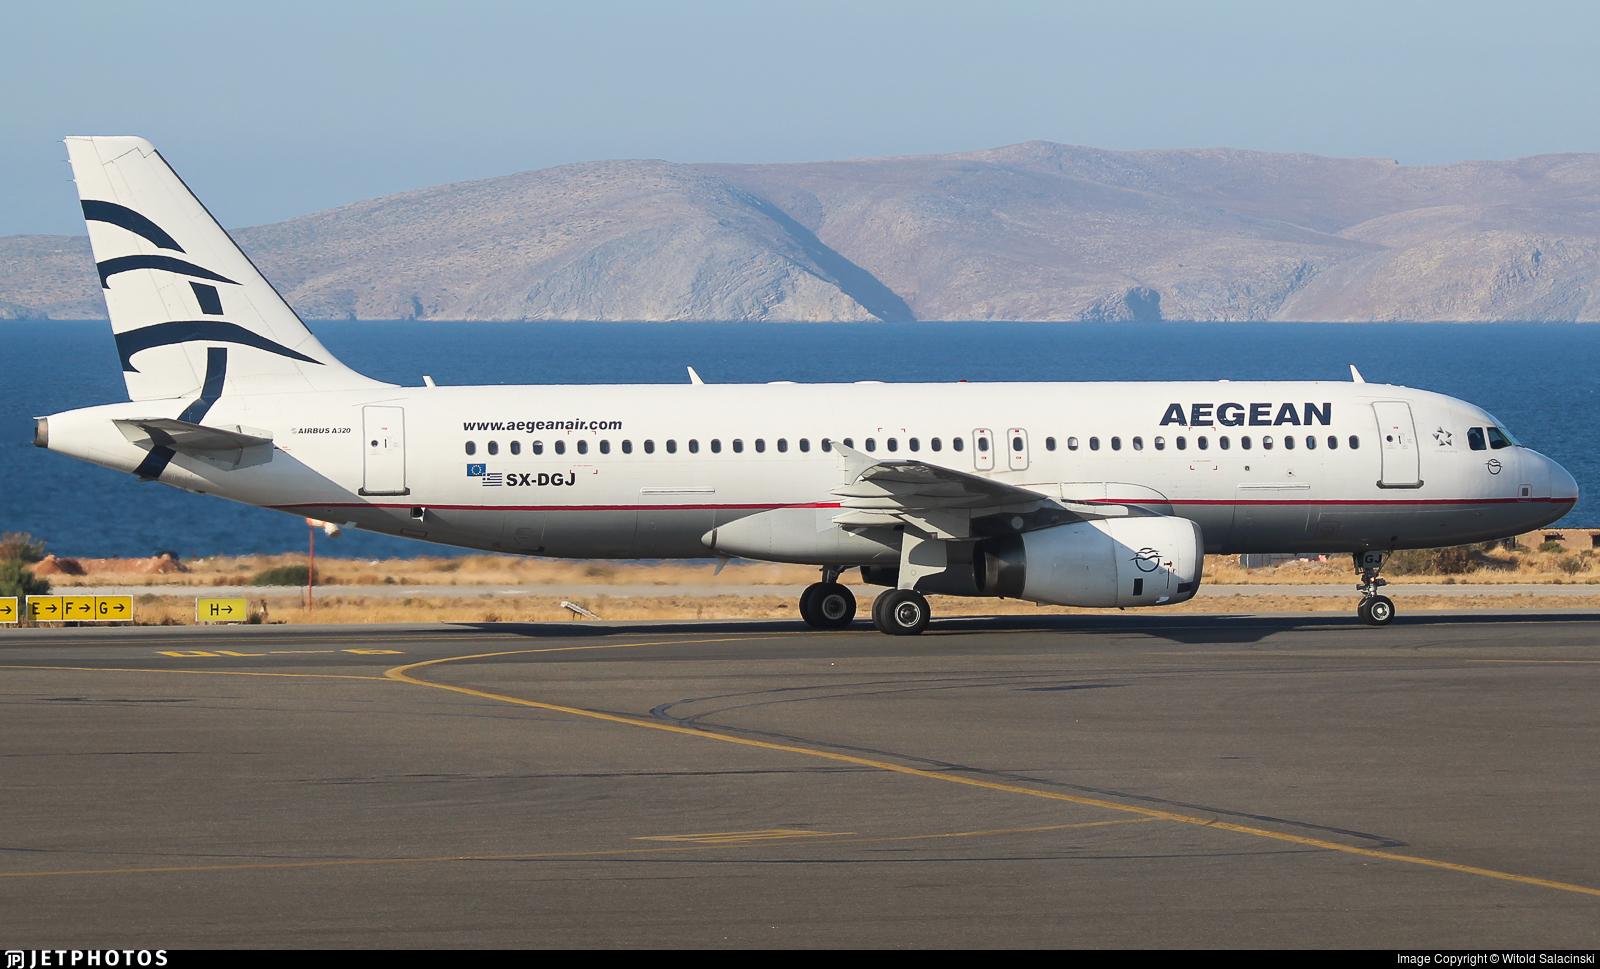 SX-DGJ - Airbus A320-232 - Aegean Airlines